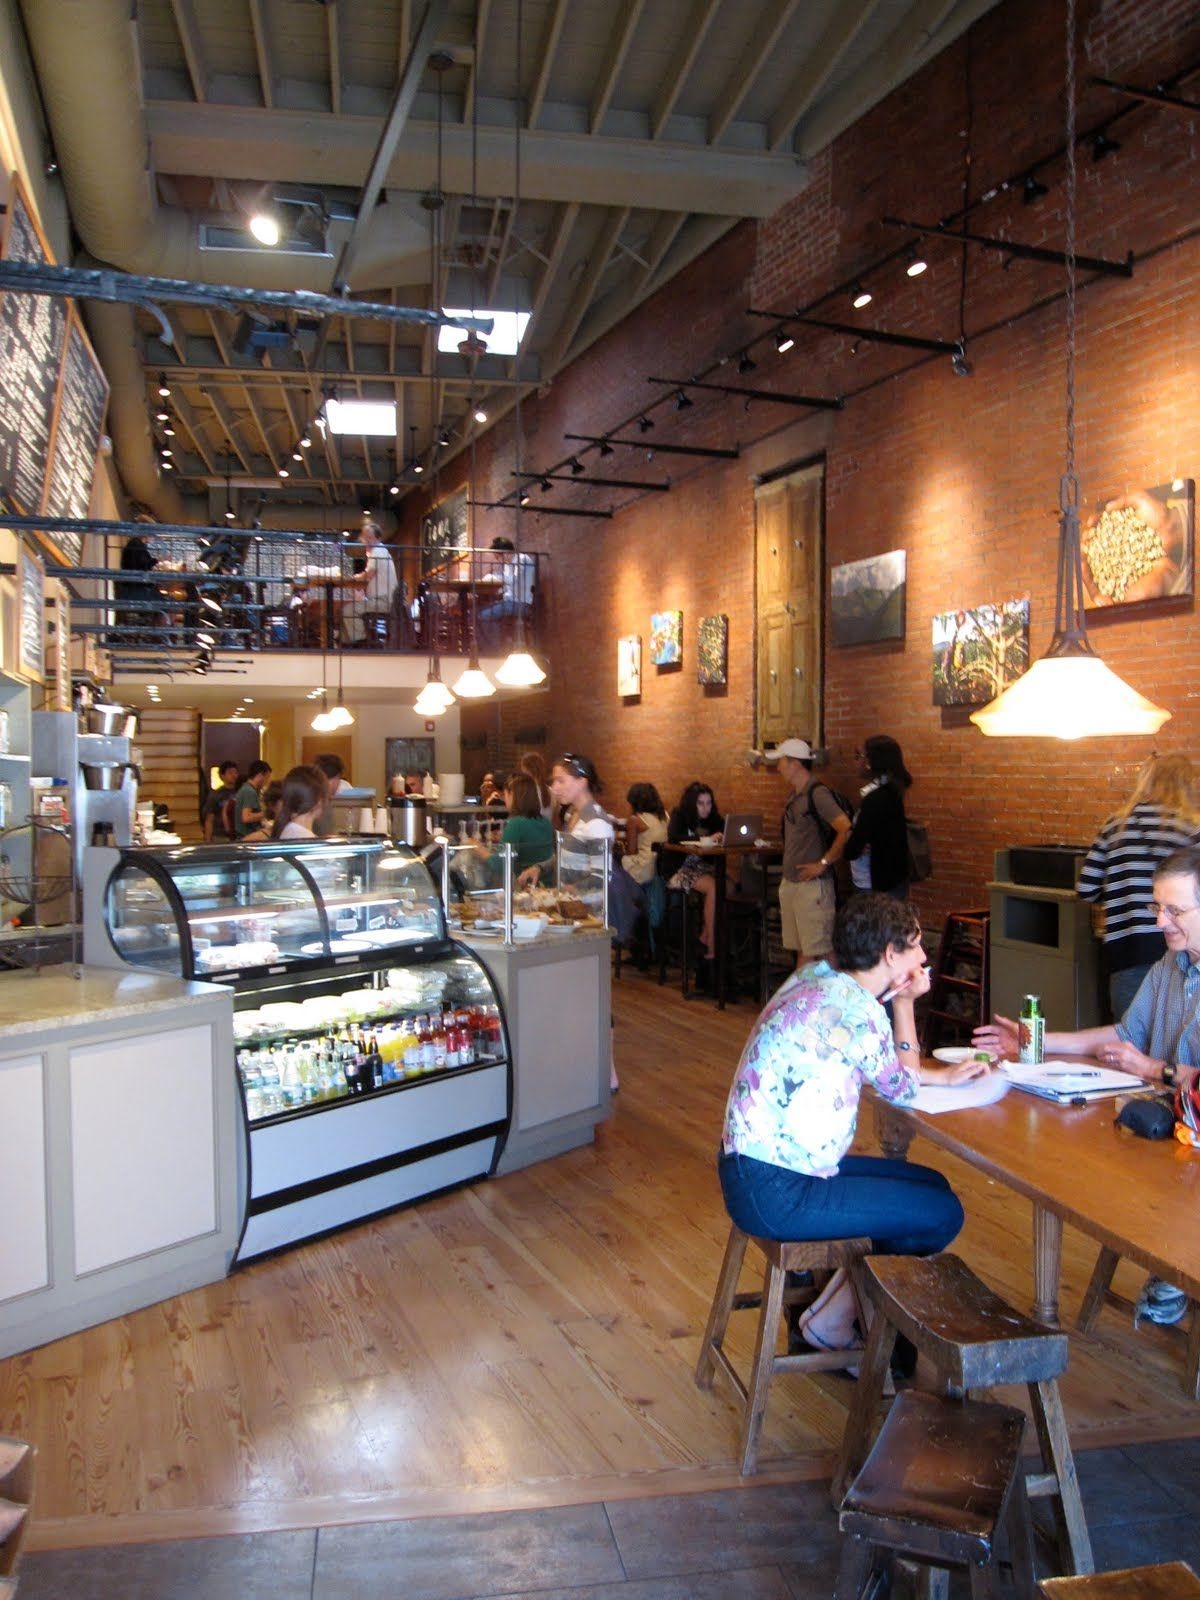 Cafe Interior Design | Coffee shops interior, Bakery shop ...